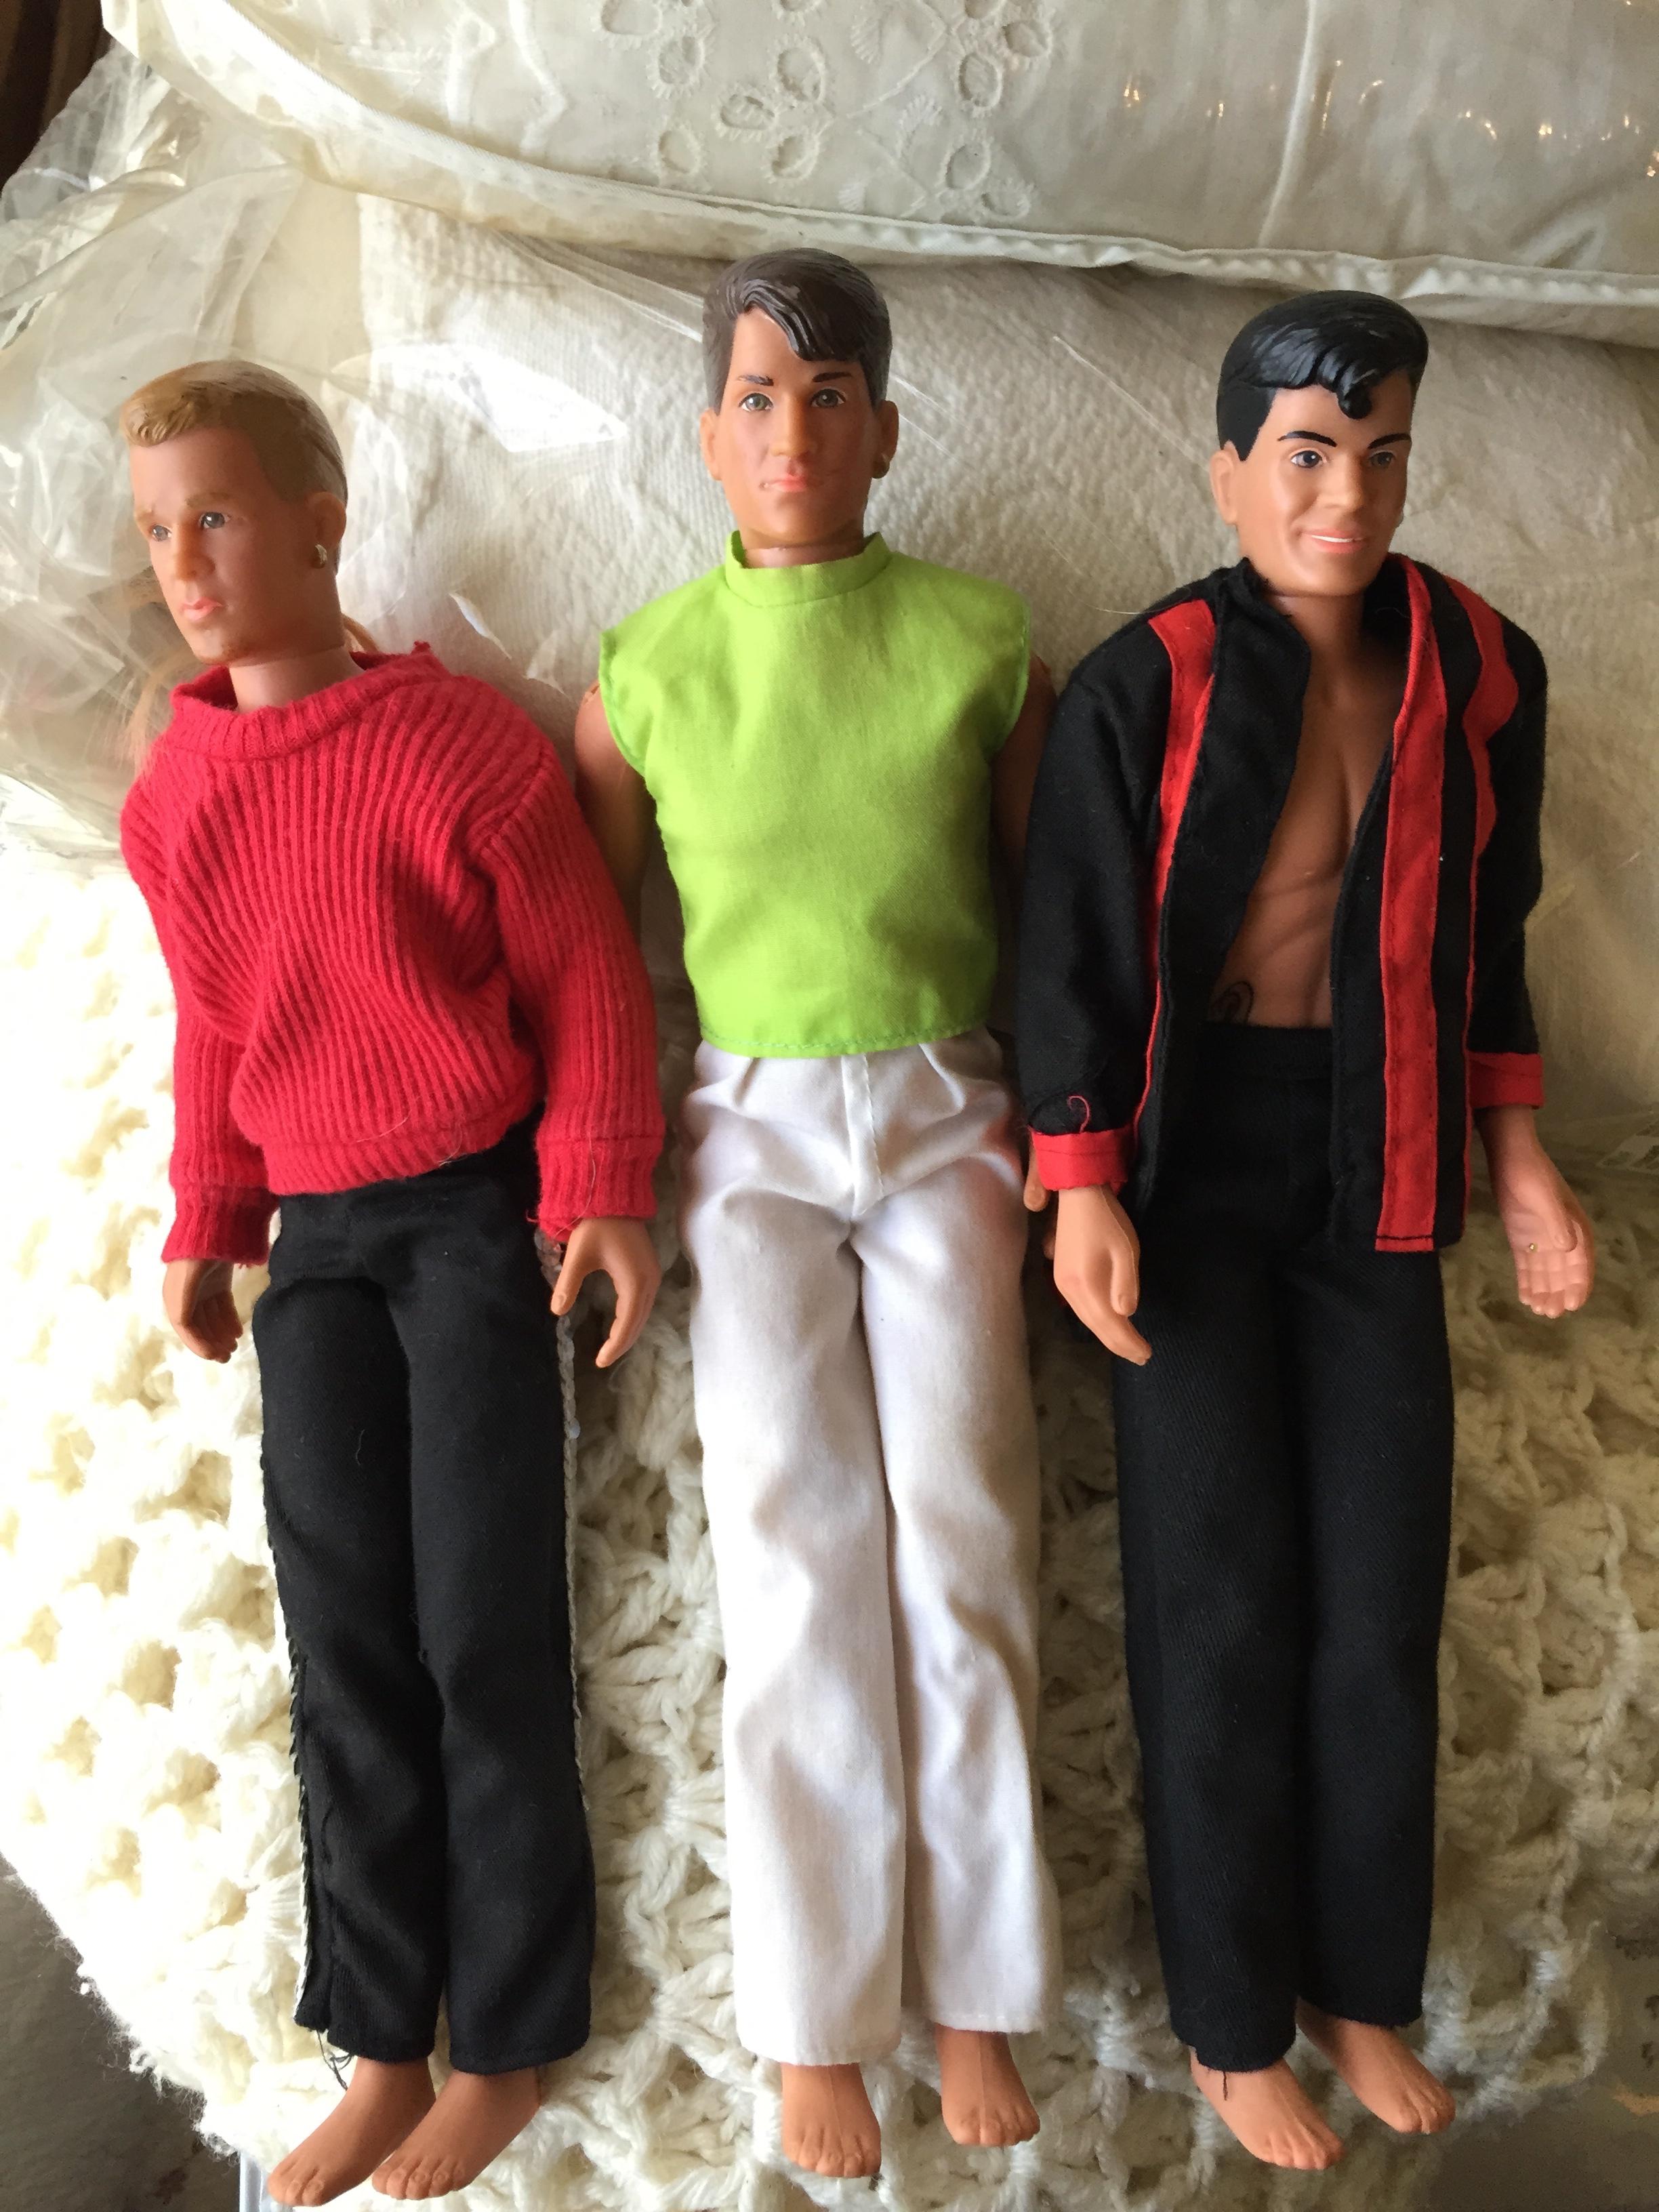 New Kids on the Block dolls